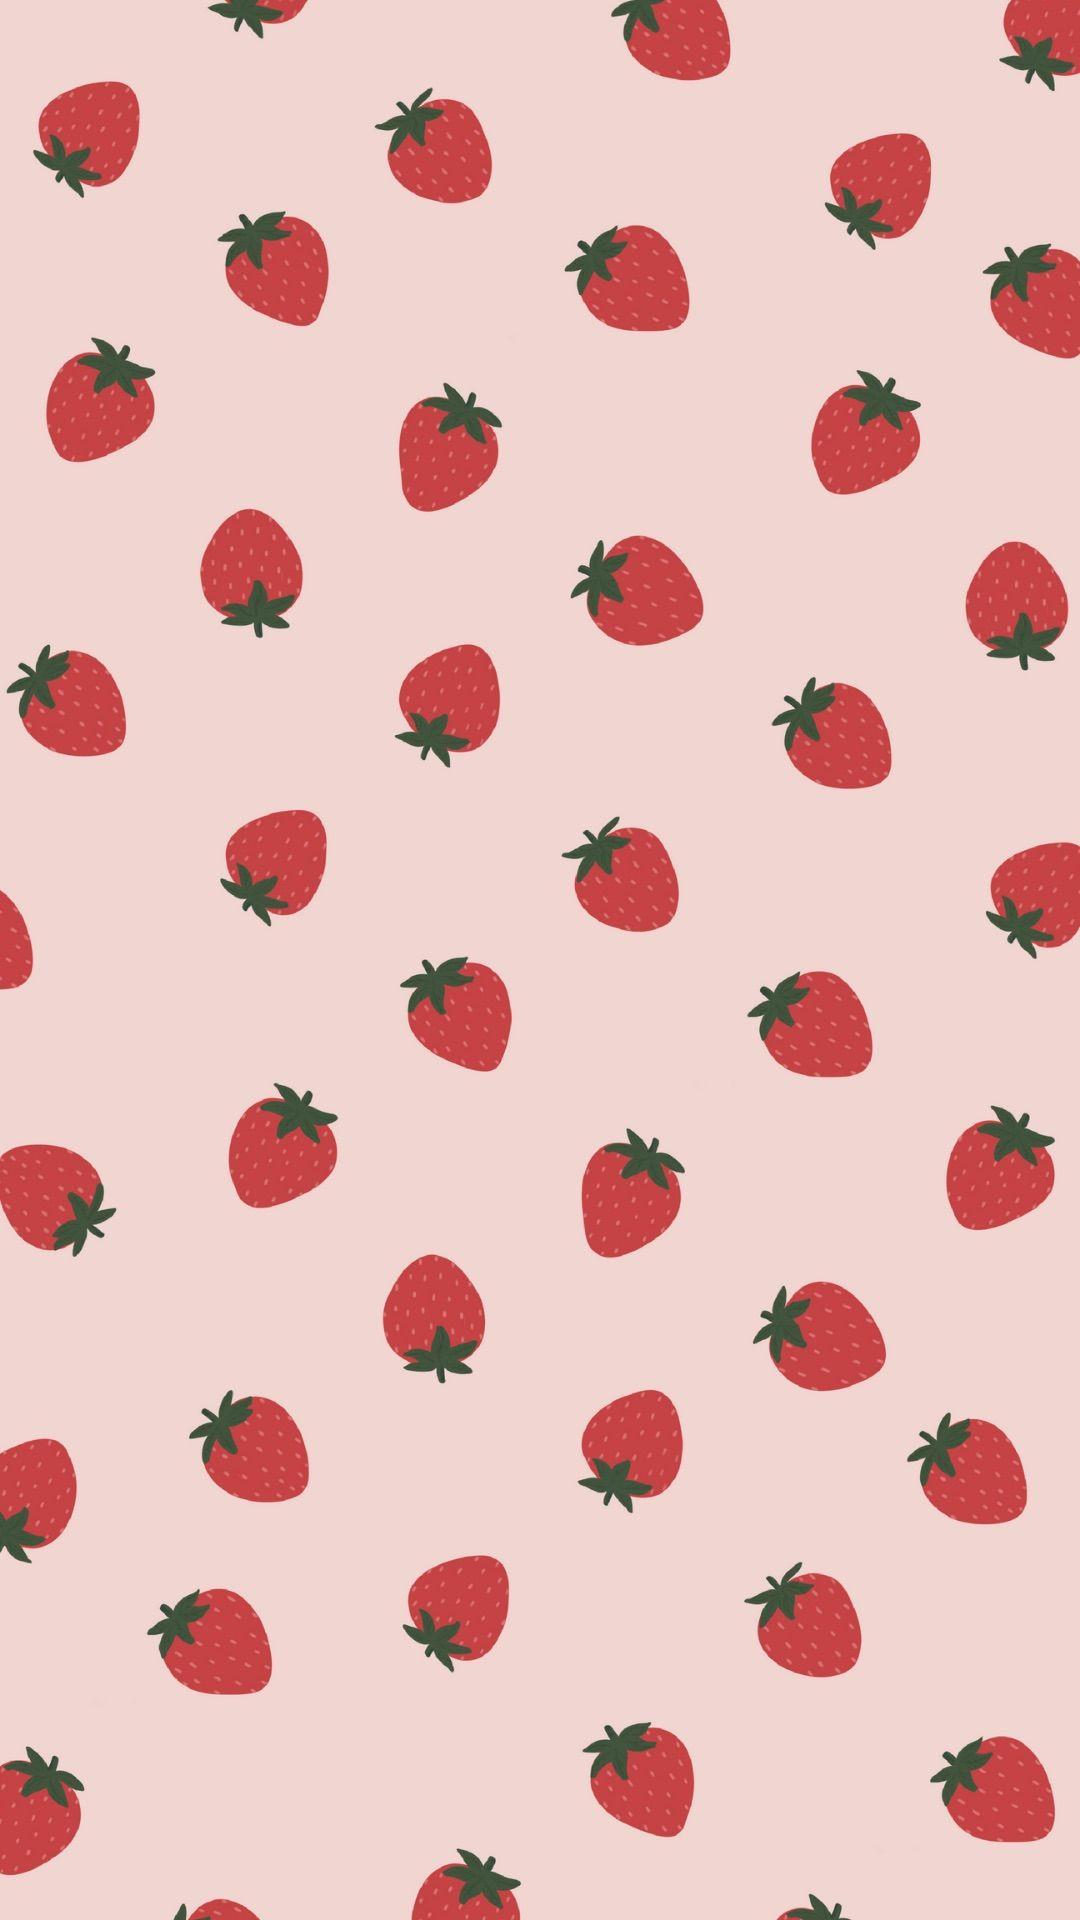 FREE! Strawberry Summer Phone Wallpapers - Miloe Joanne